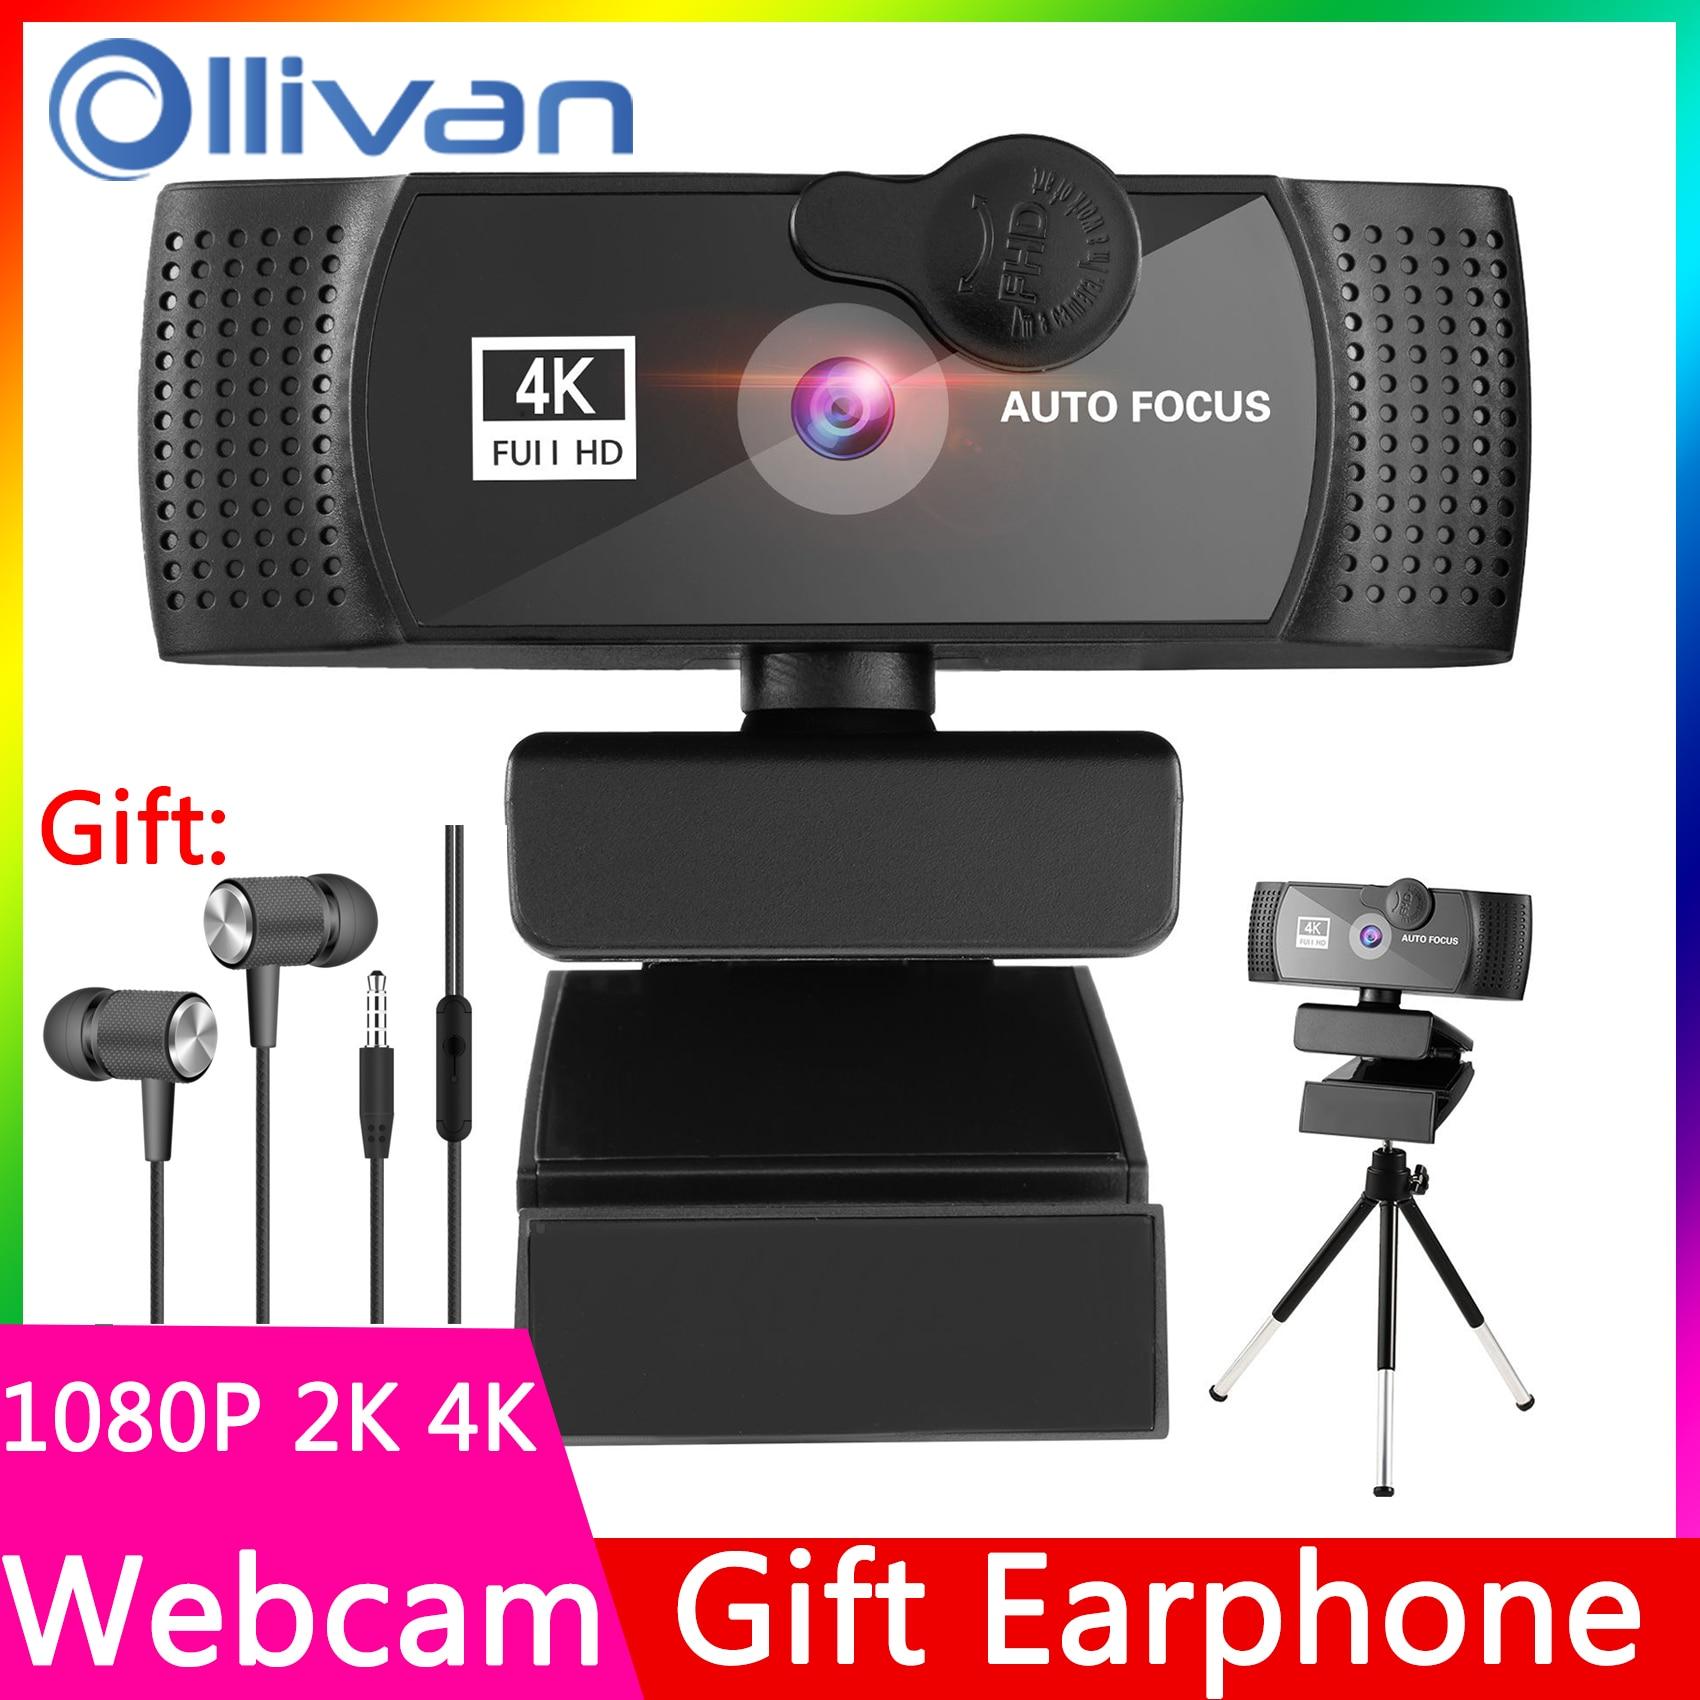 Webcam 4K 2K 1080P cámara Web Para computadora cámara Web de PC...